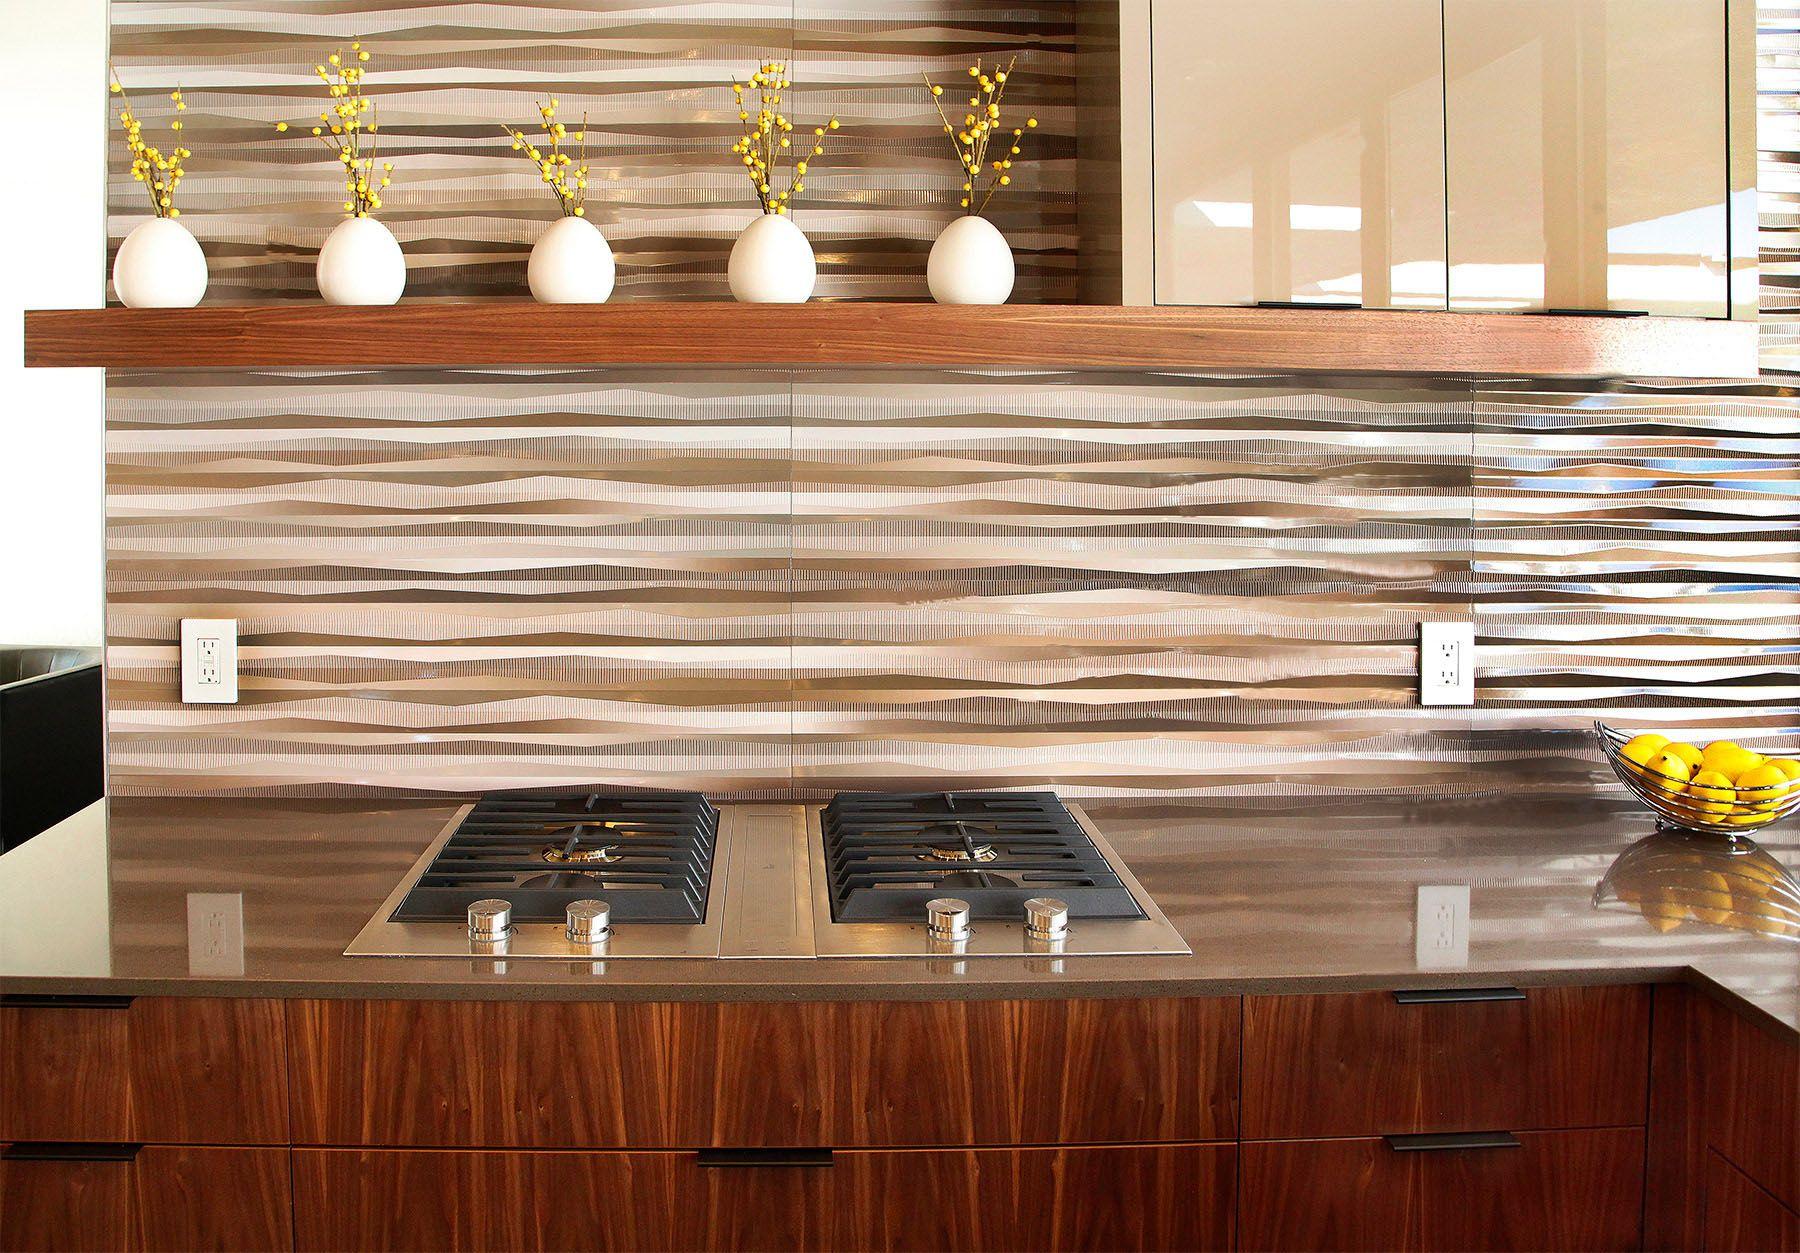 Kitchens & Dining 29.jpg